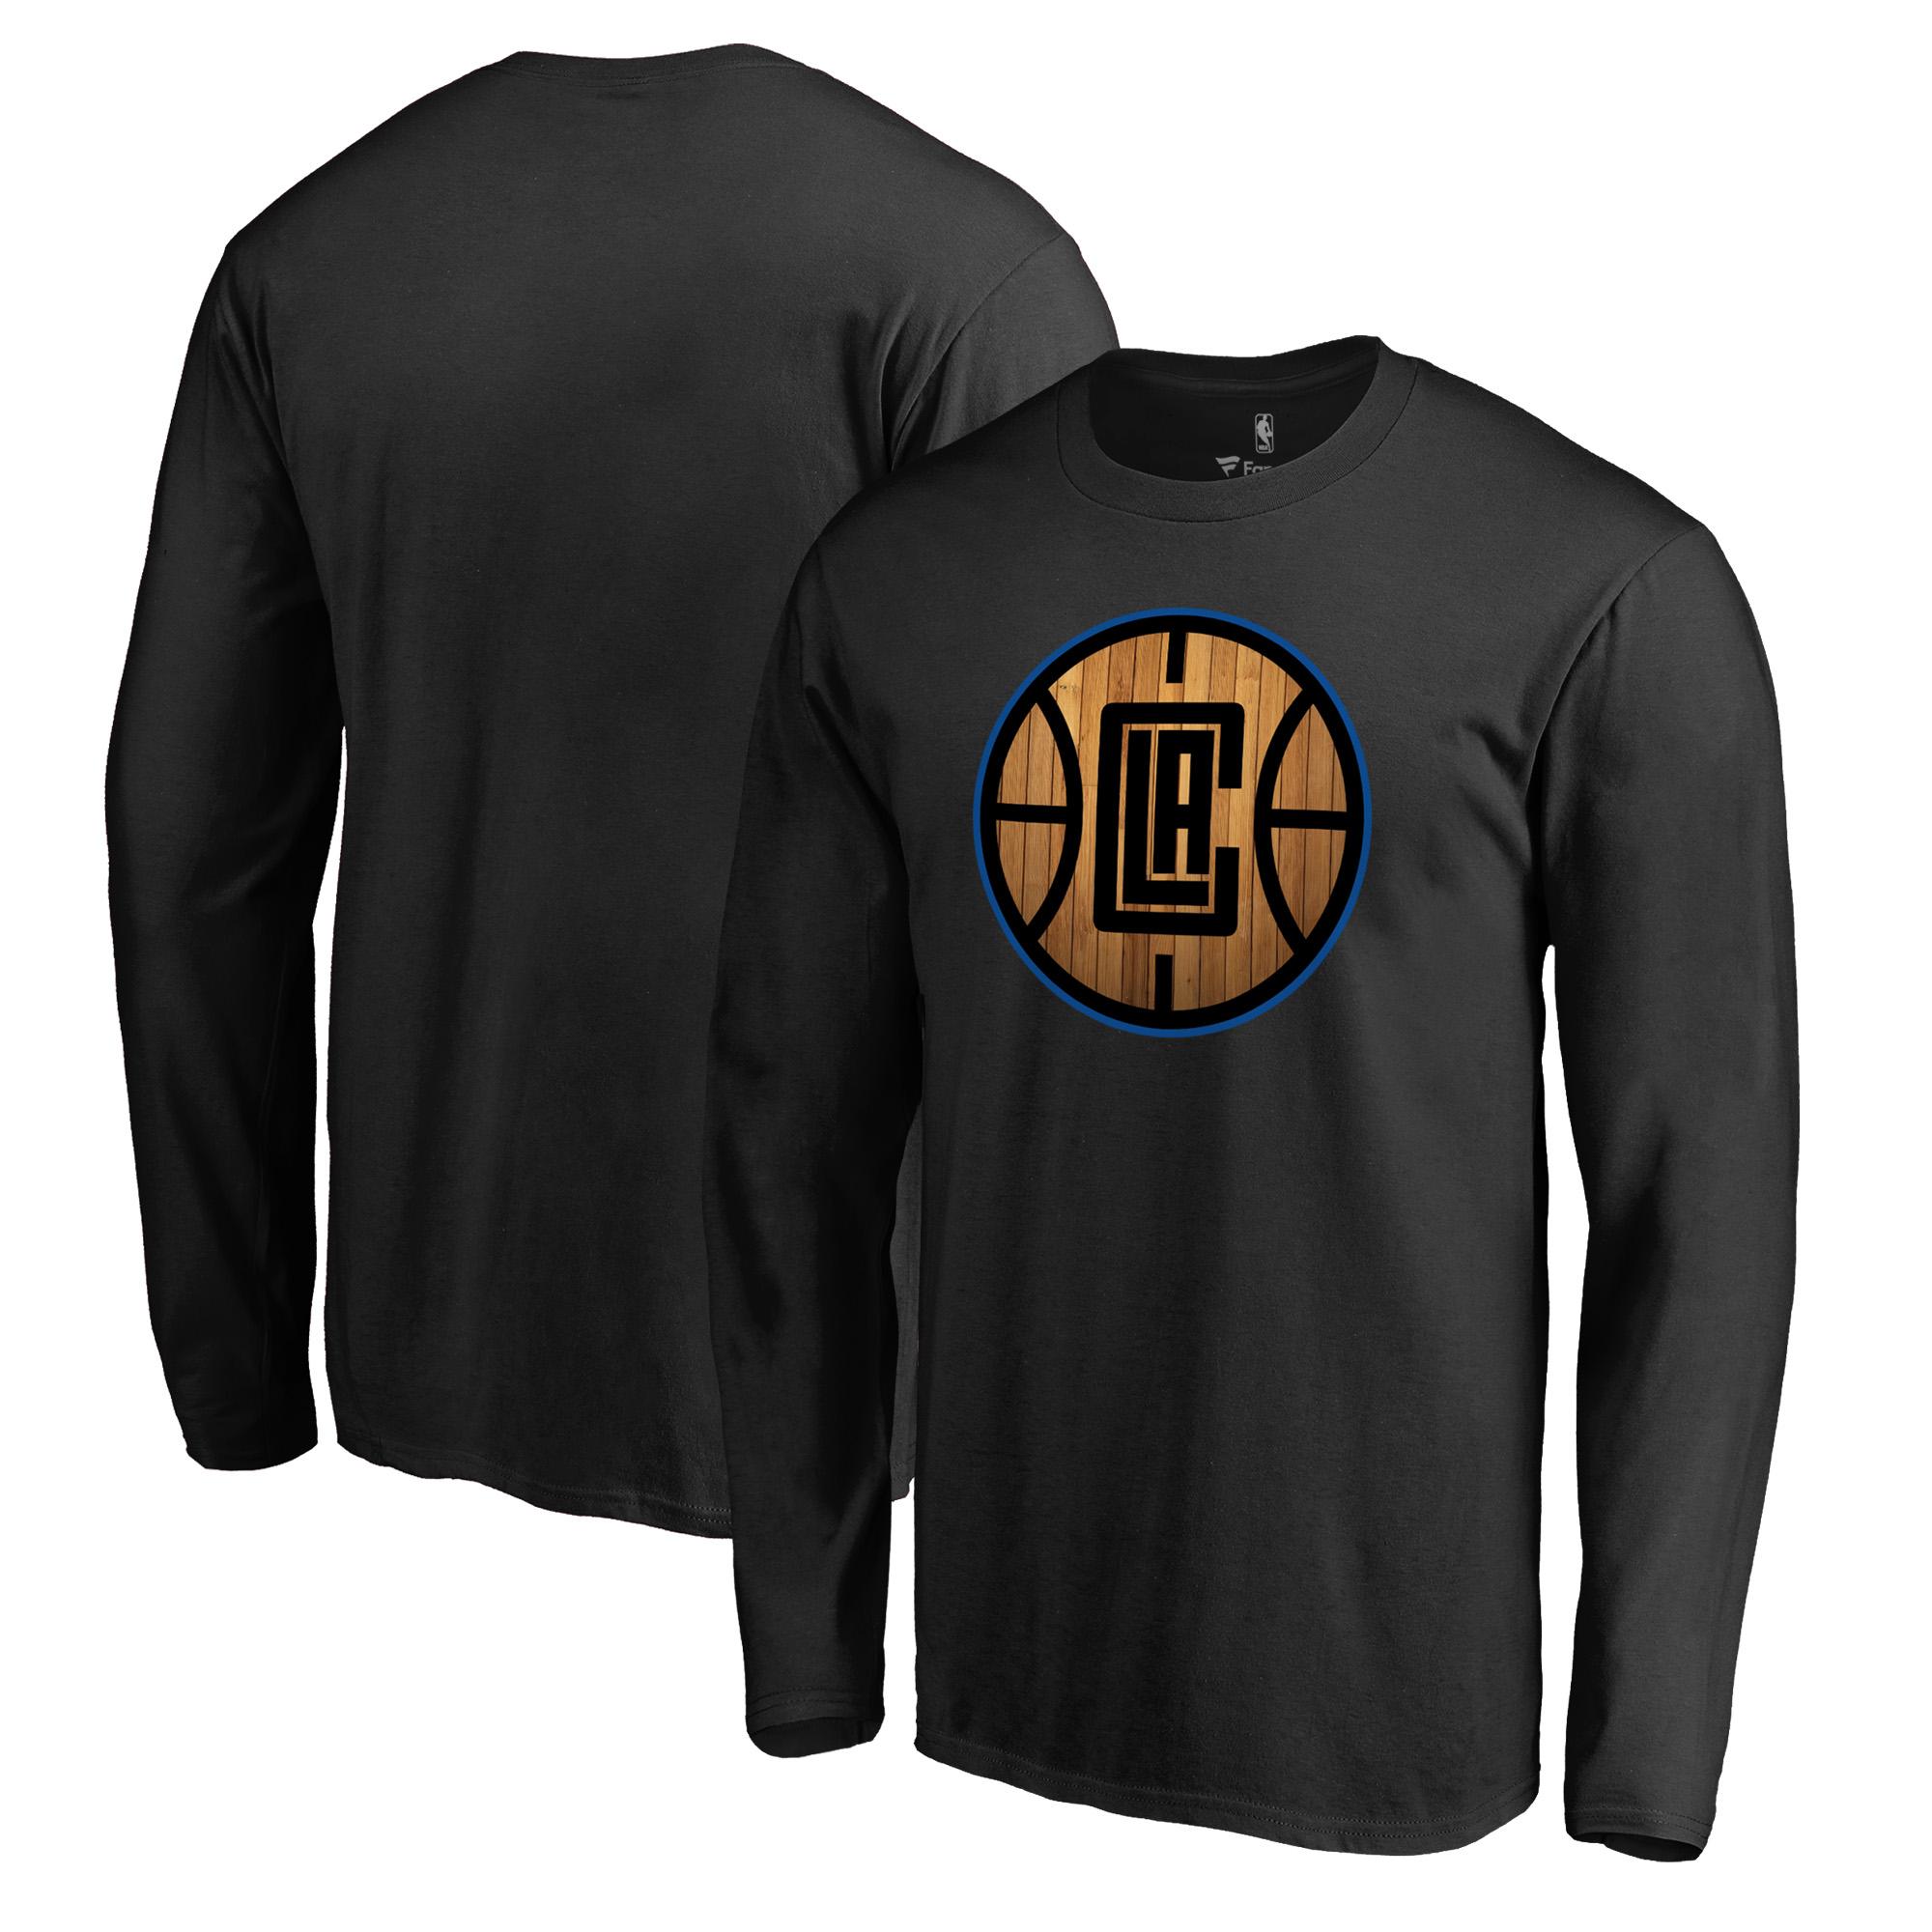 LA Clippers Fanatics Branded Hardwood Long Sleeve T-Shirt - Black